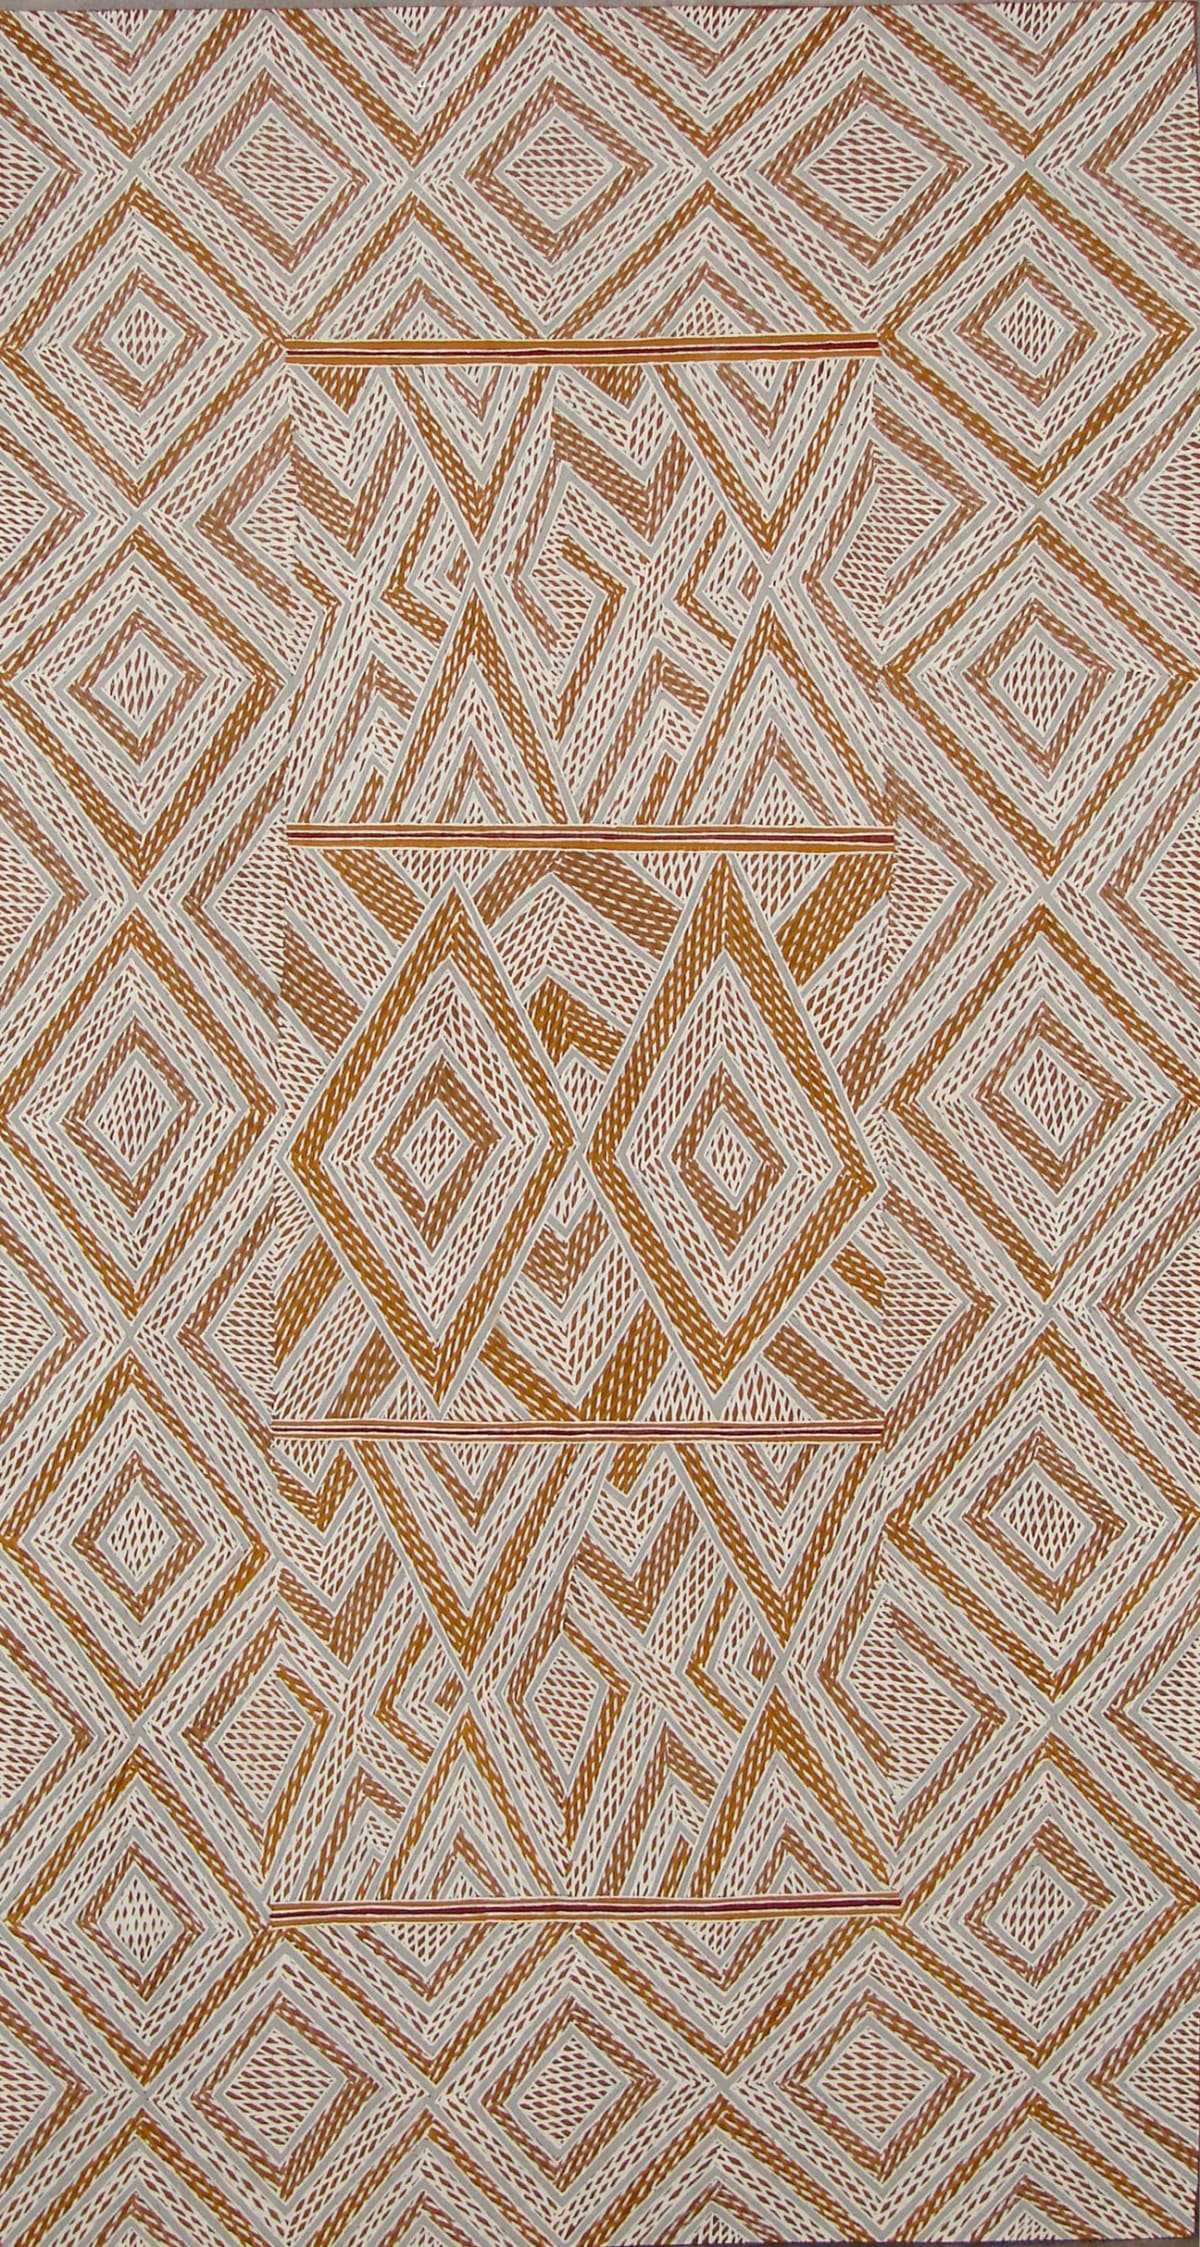 Garawan Wanambi Marrangu natural earth pigment on bark 102 x 54 cm